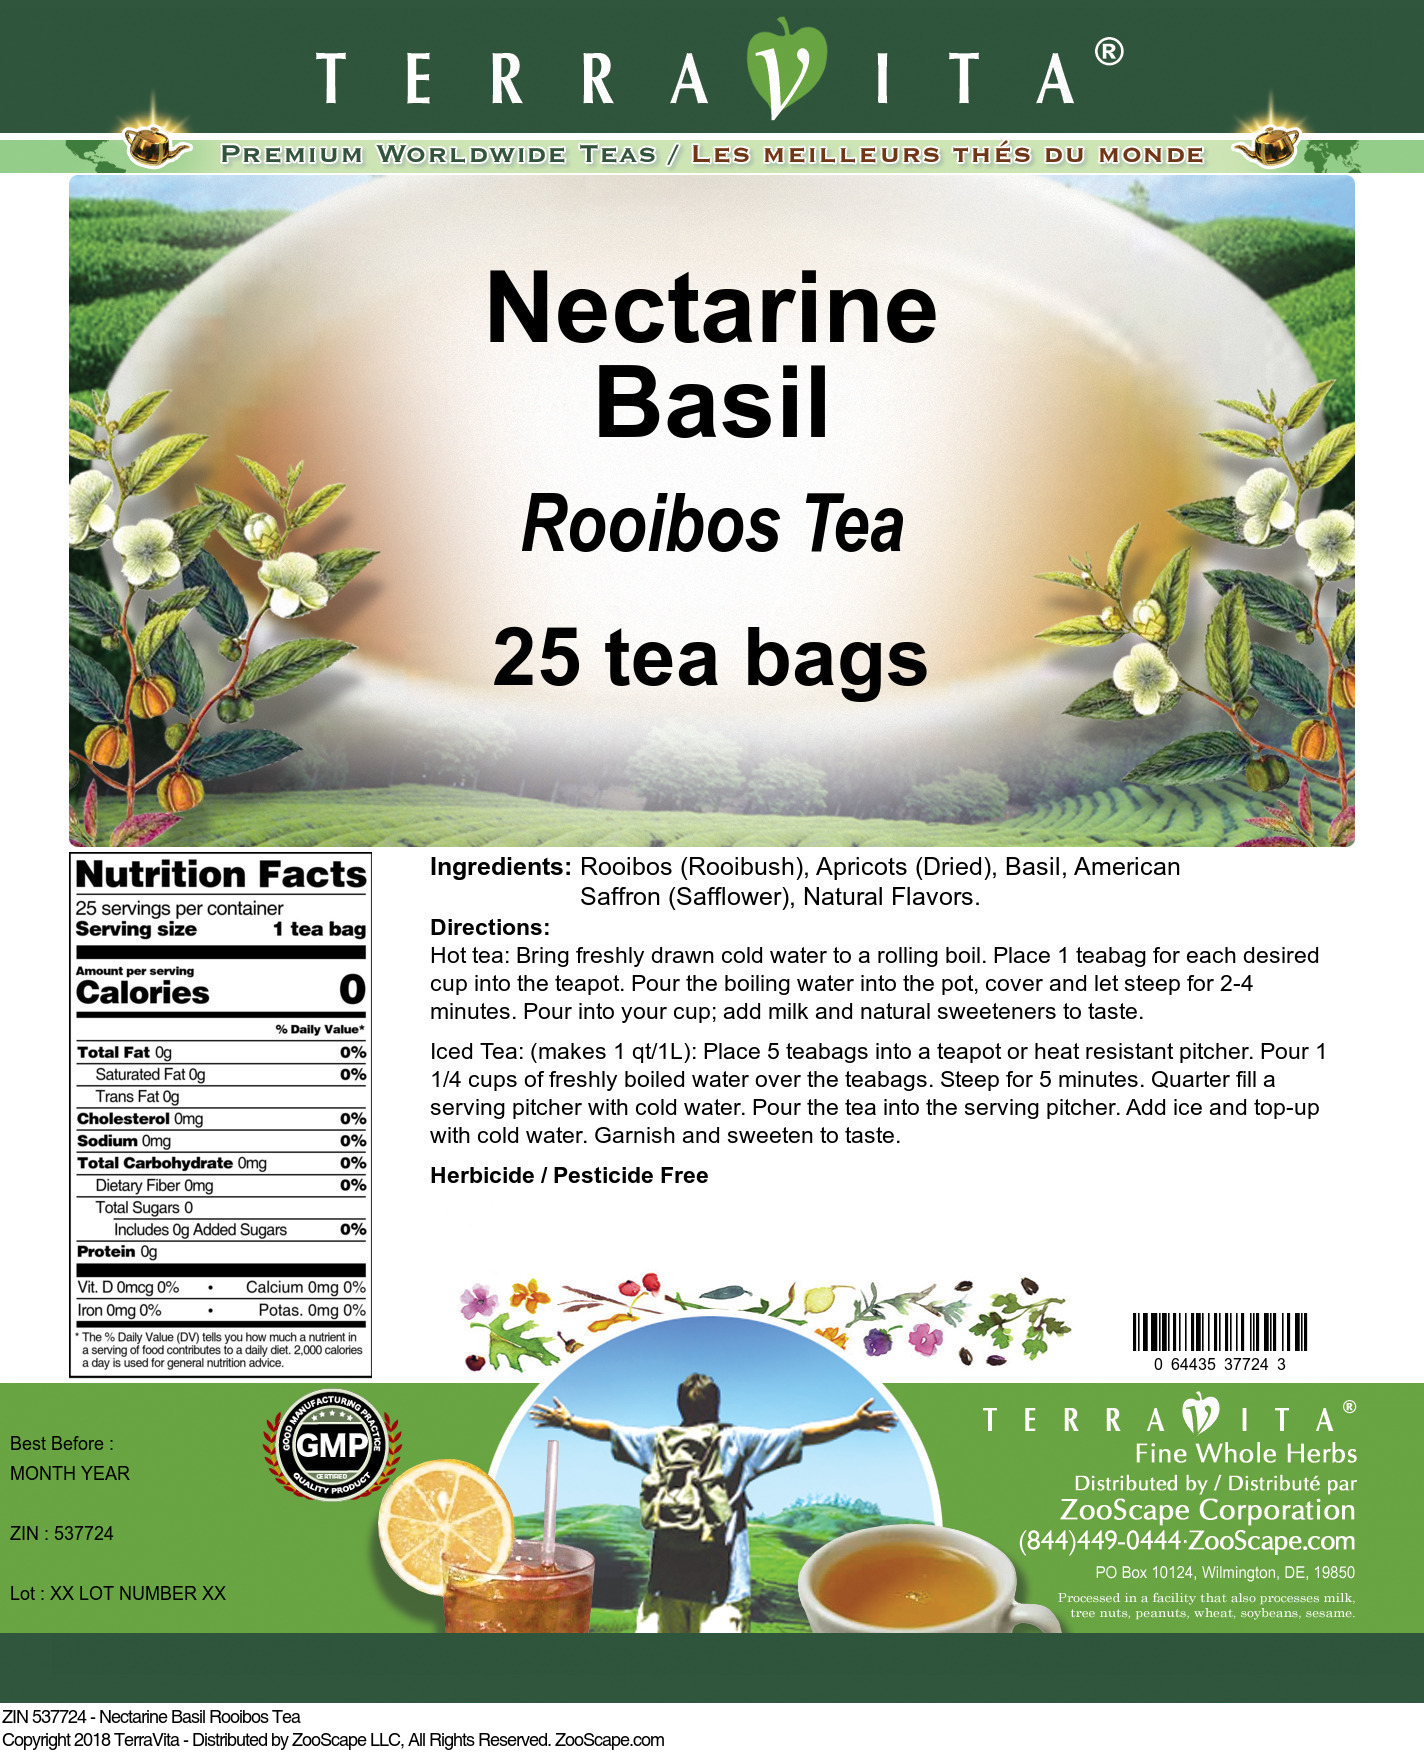 Nectarine Basil Rooibos Tea